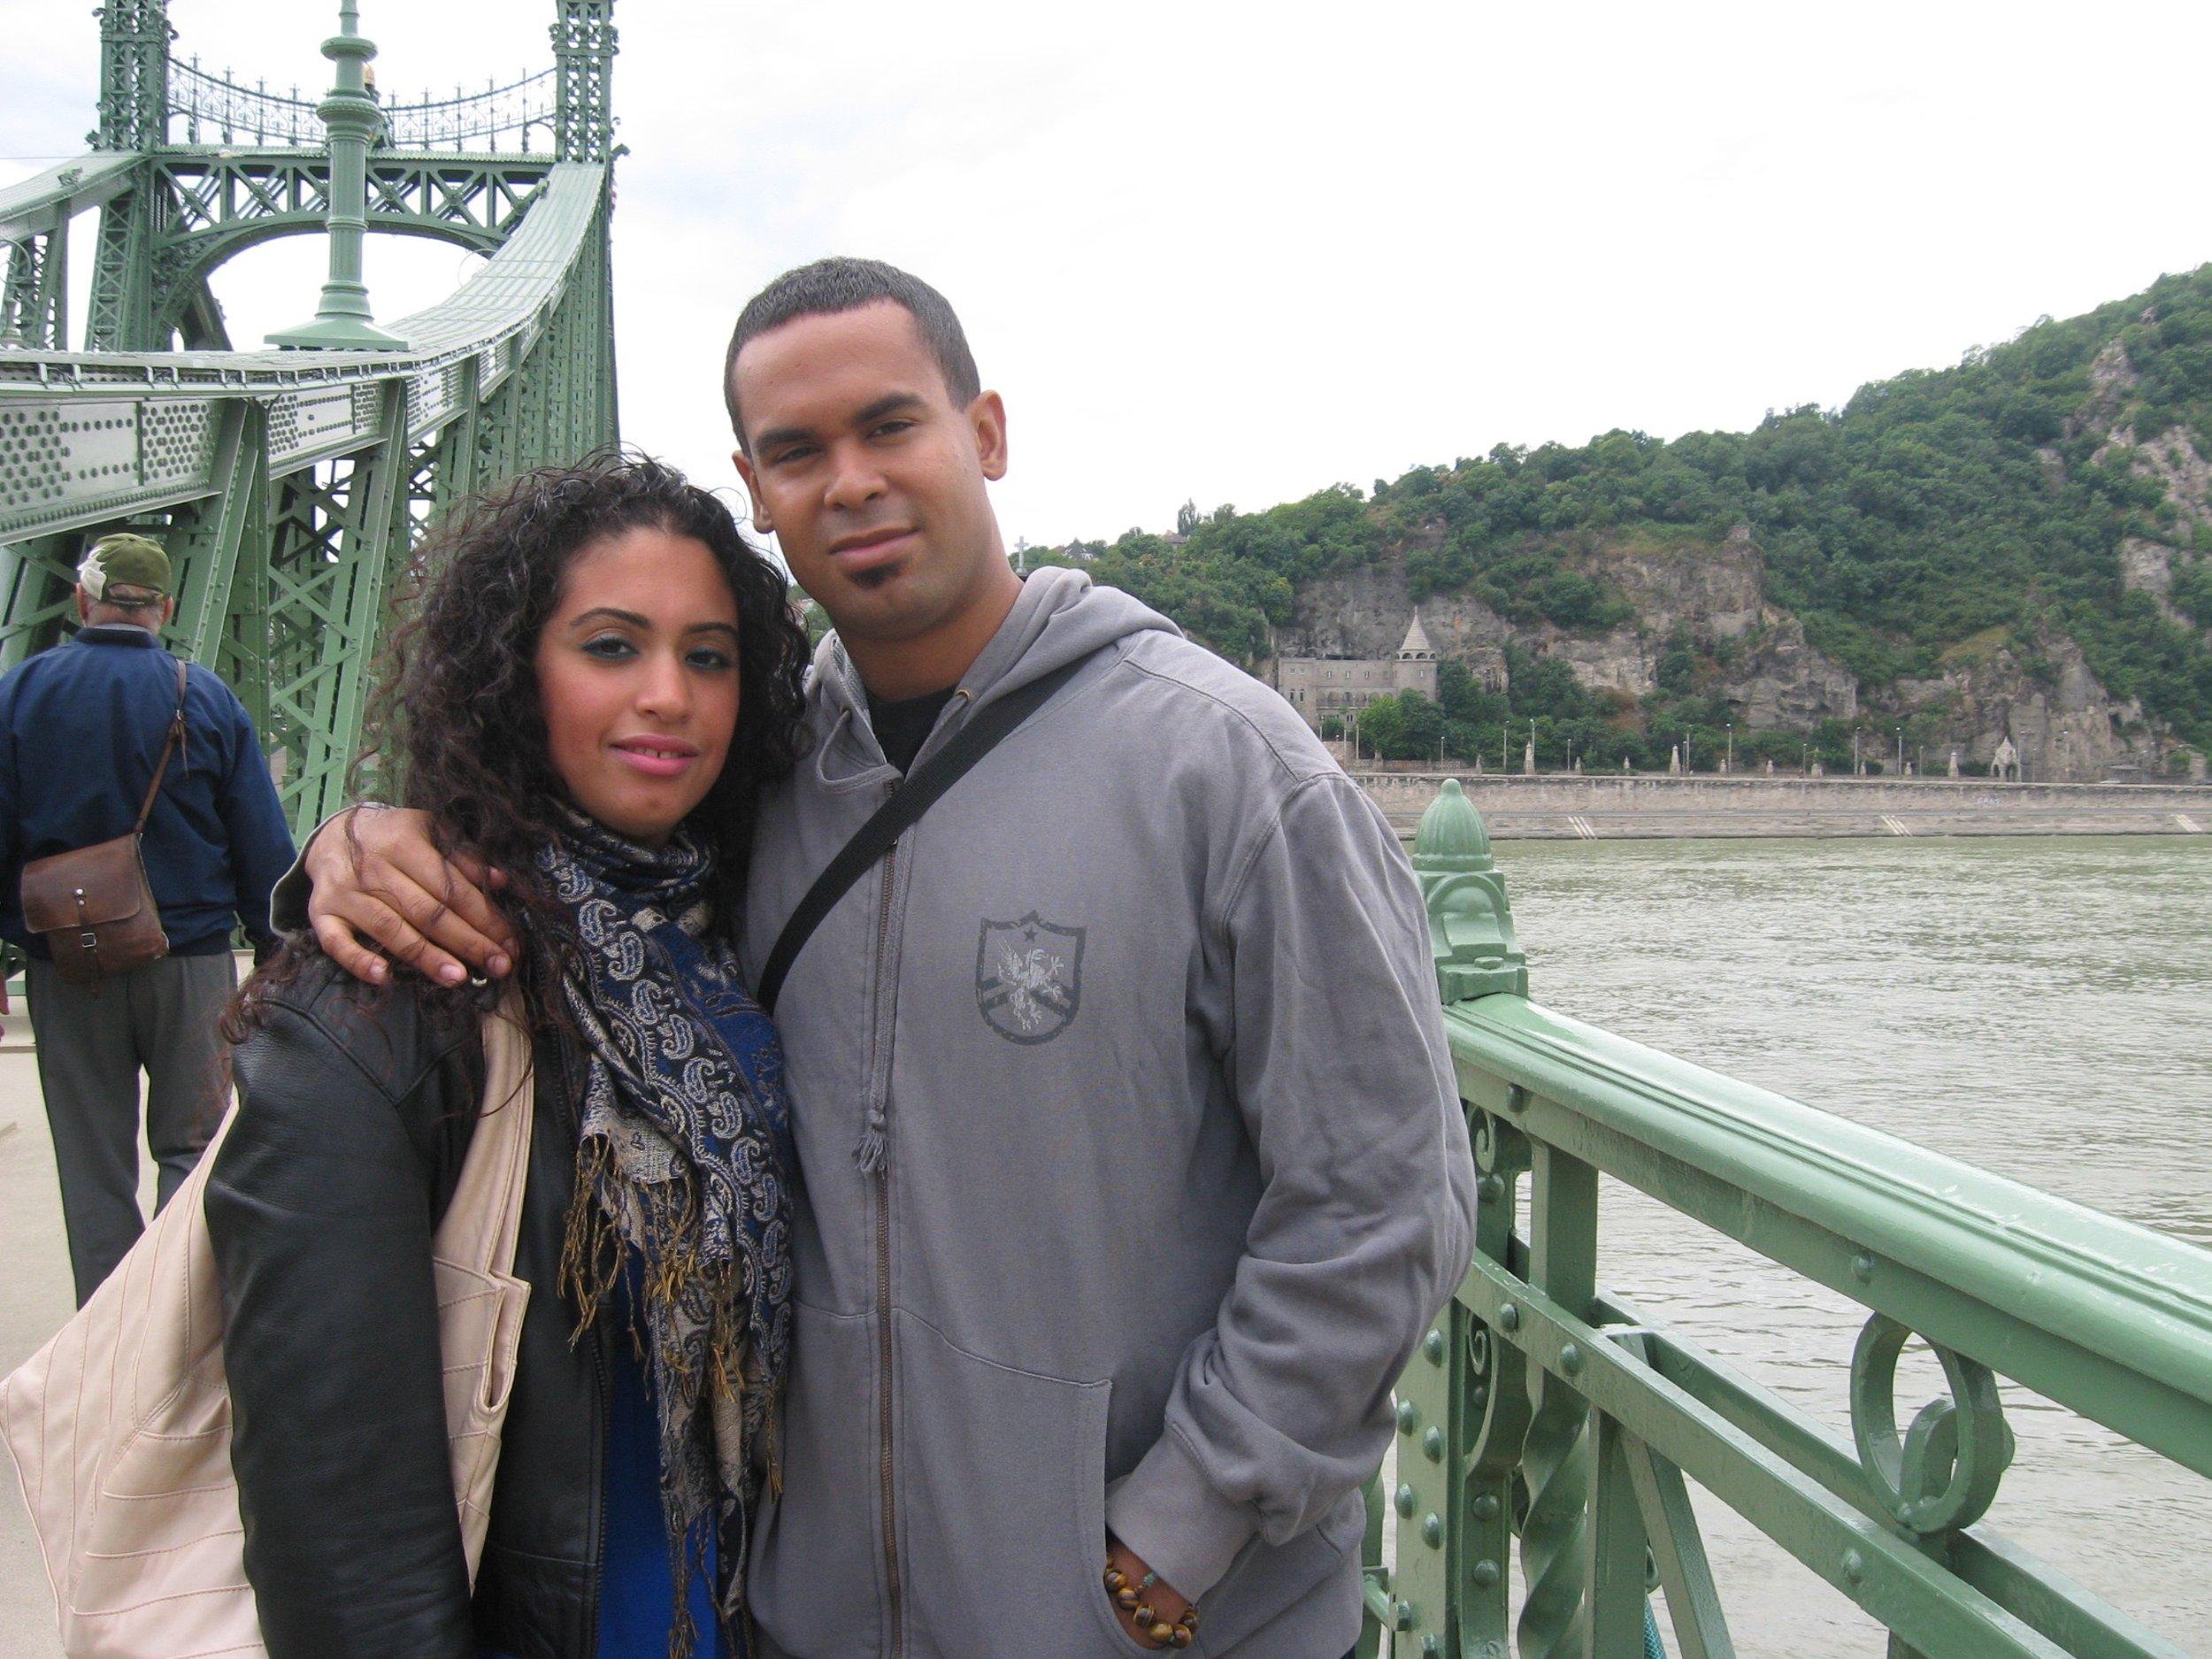 eric and jenn on bridge.jpg